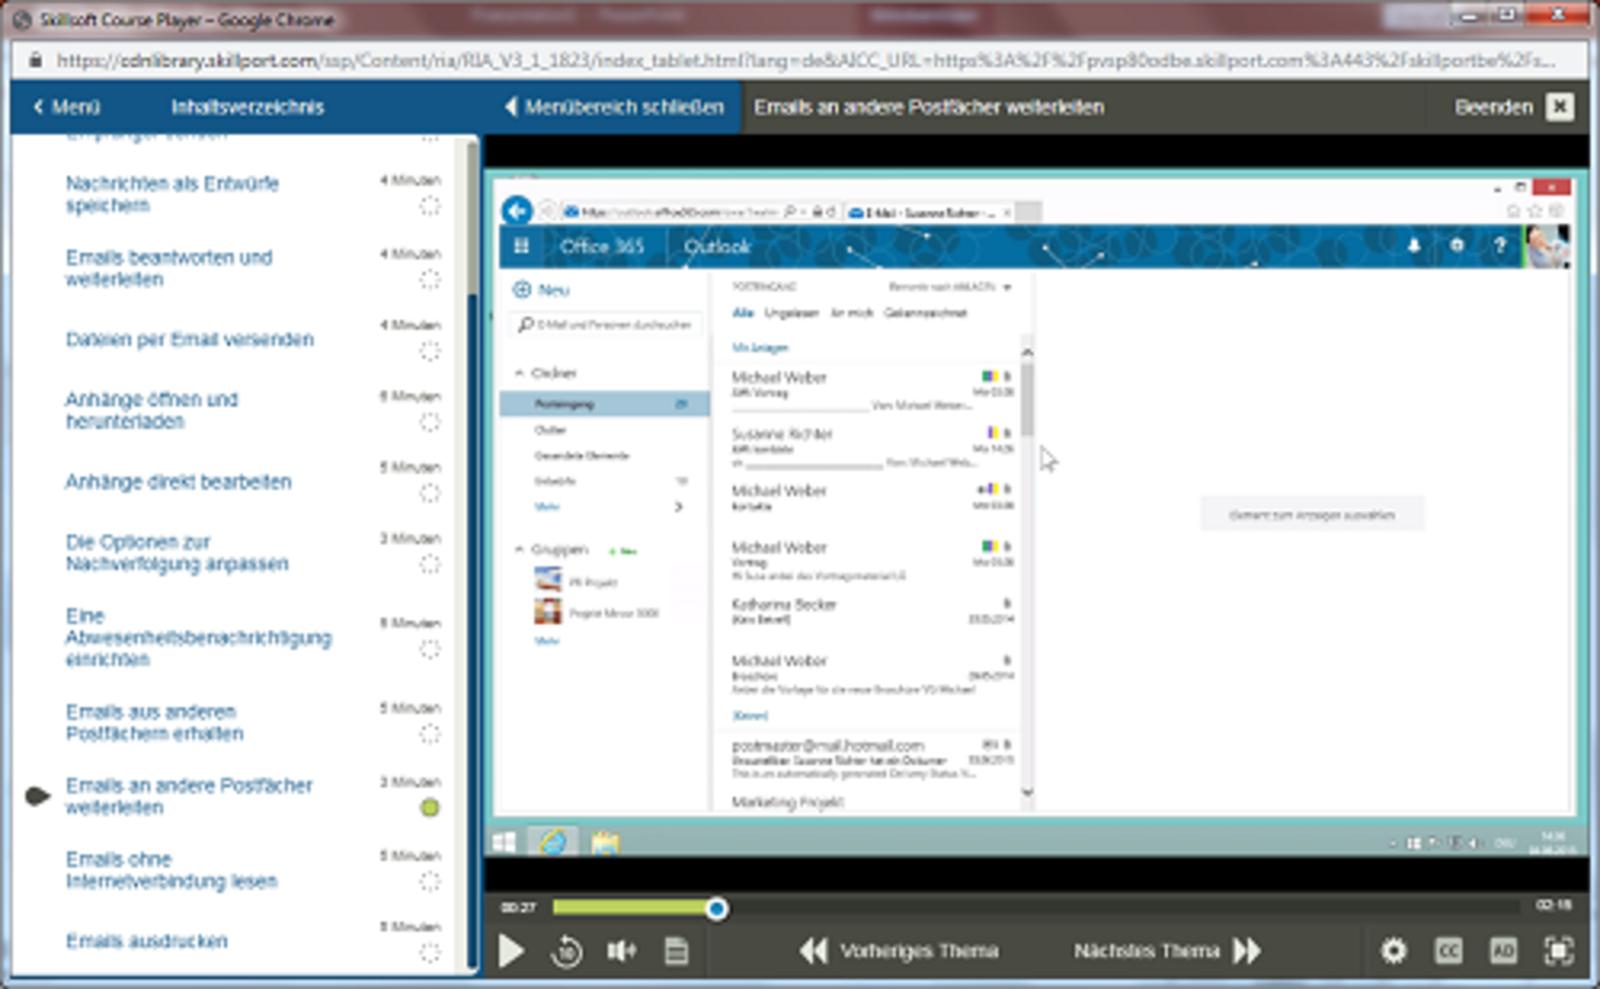 Microsoft Outlook Outlook Online Office 365